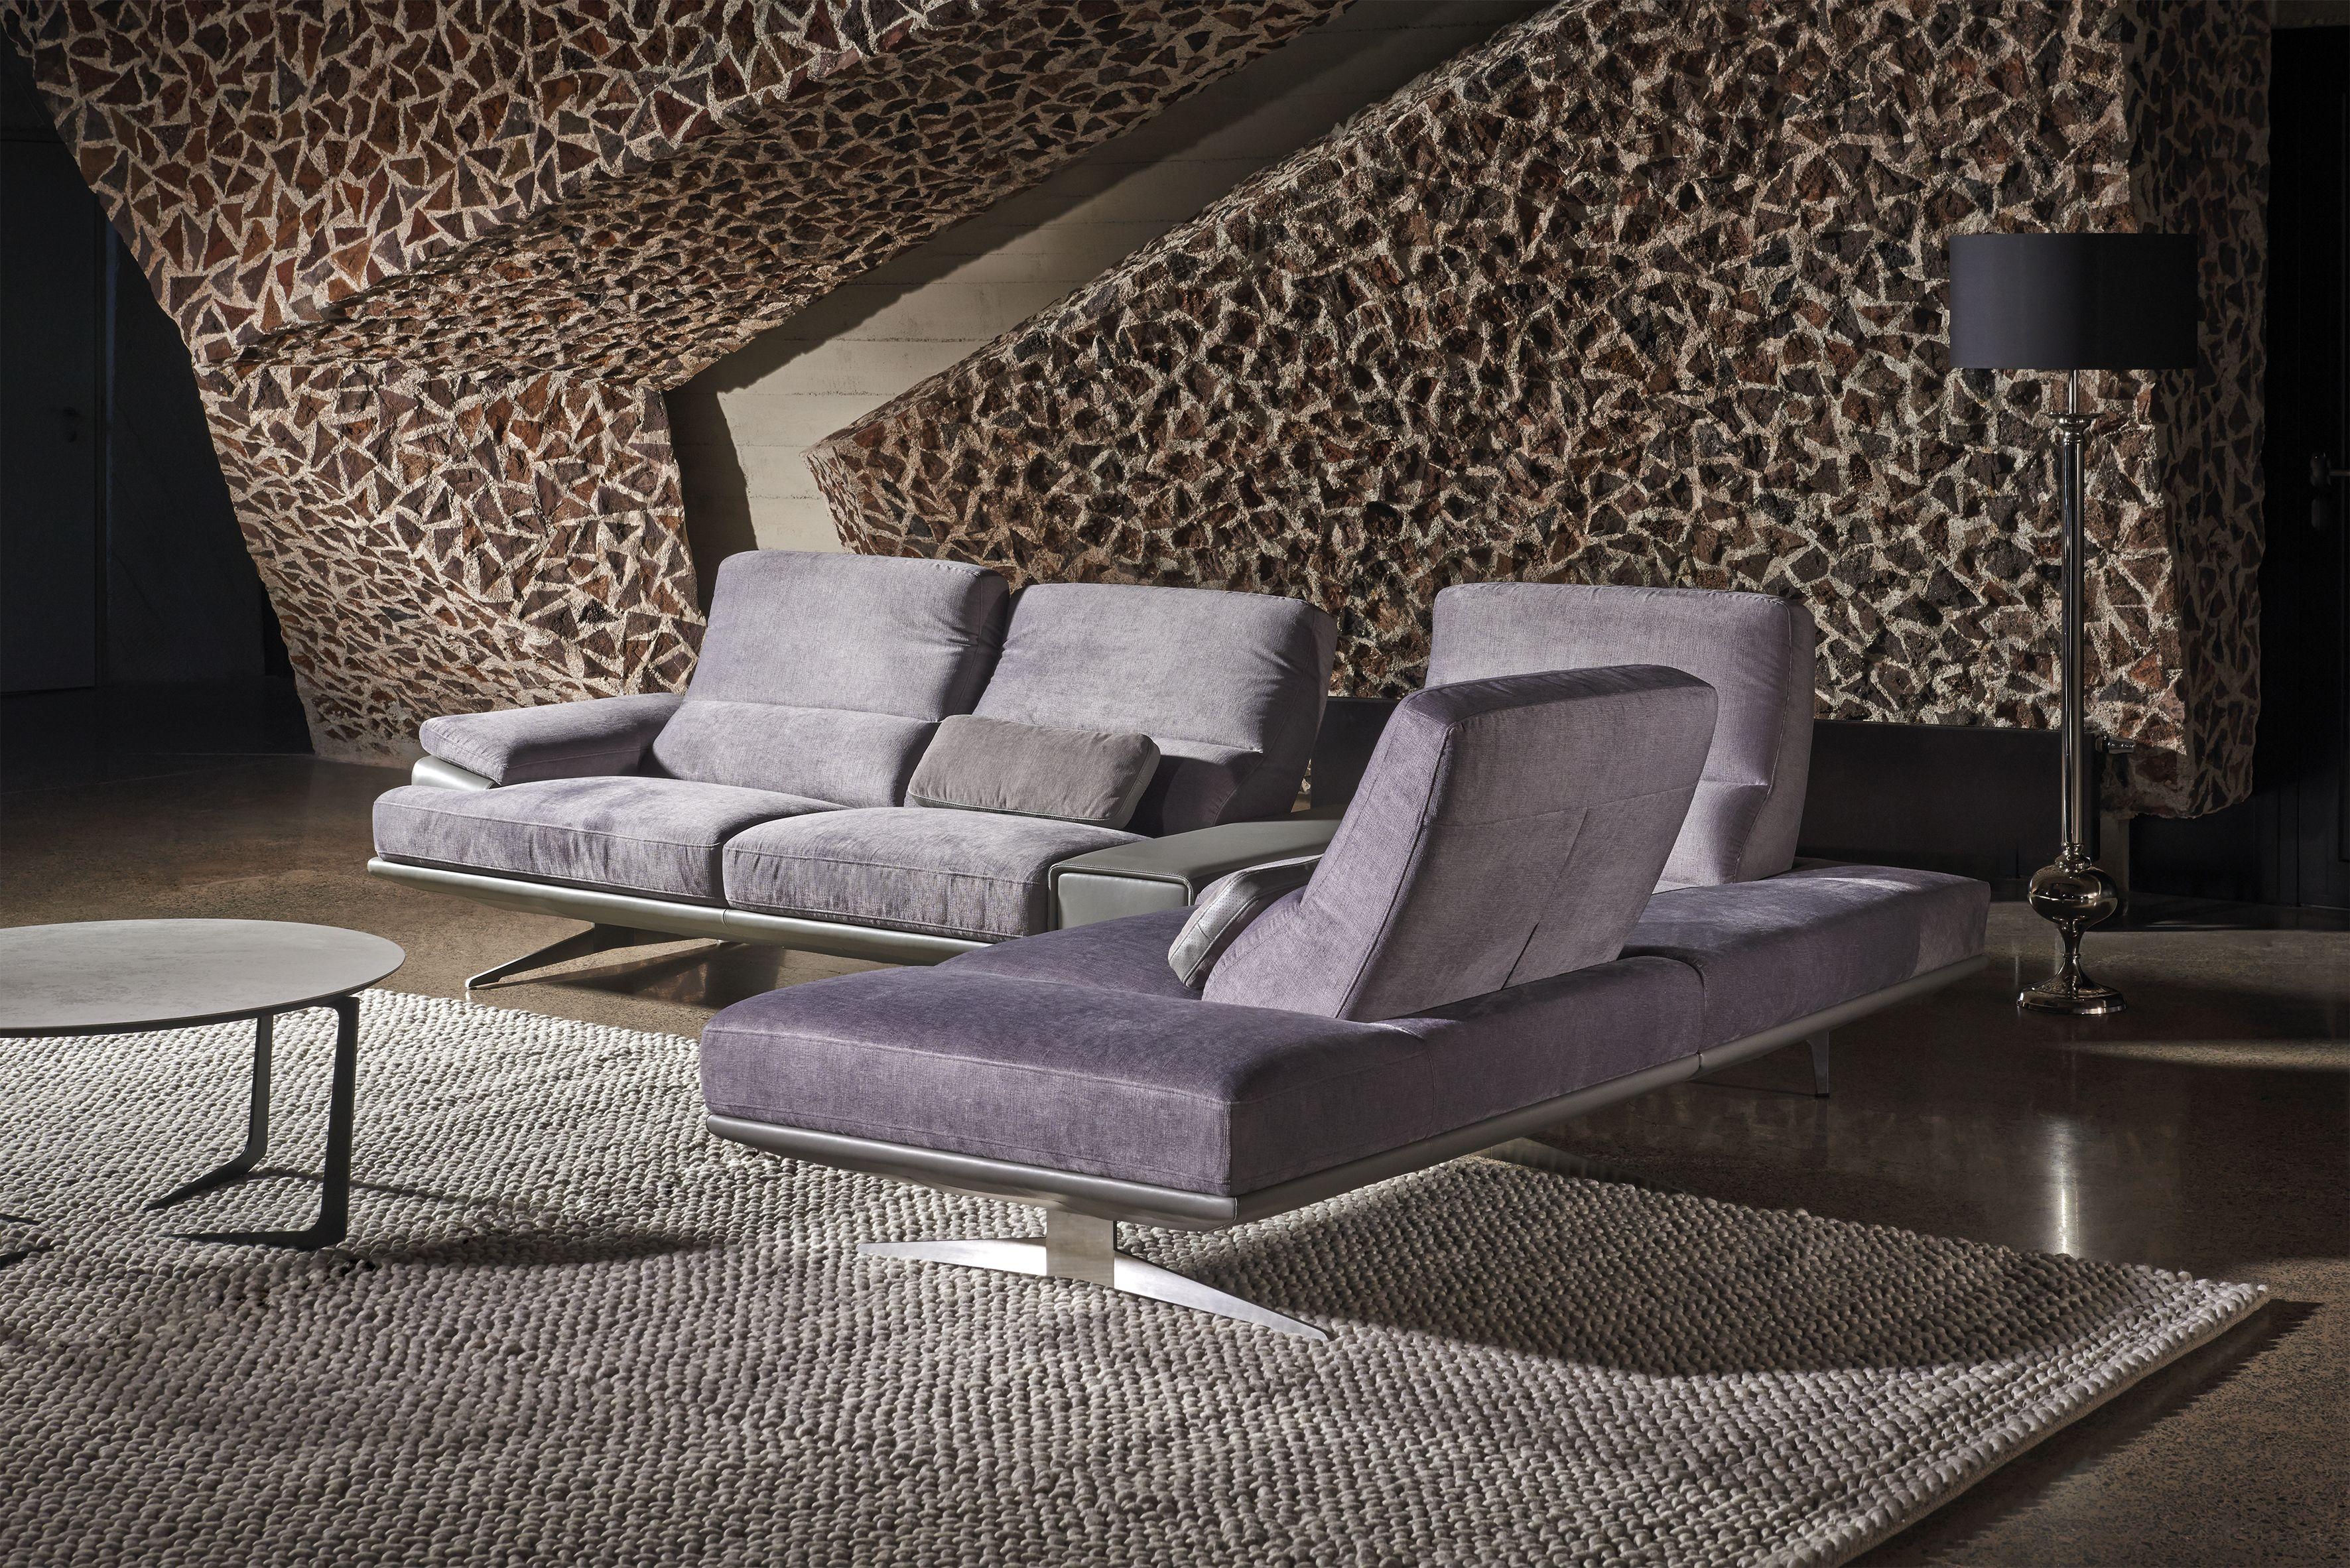 sofa Soprano kler sofa dom design styl dom quality